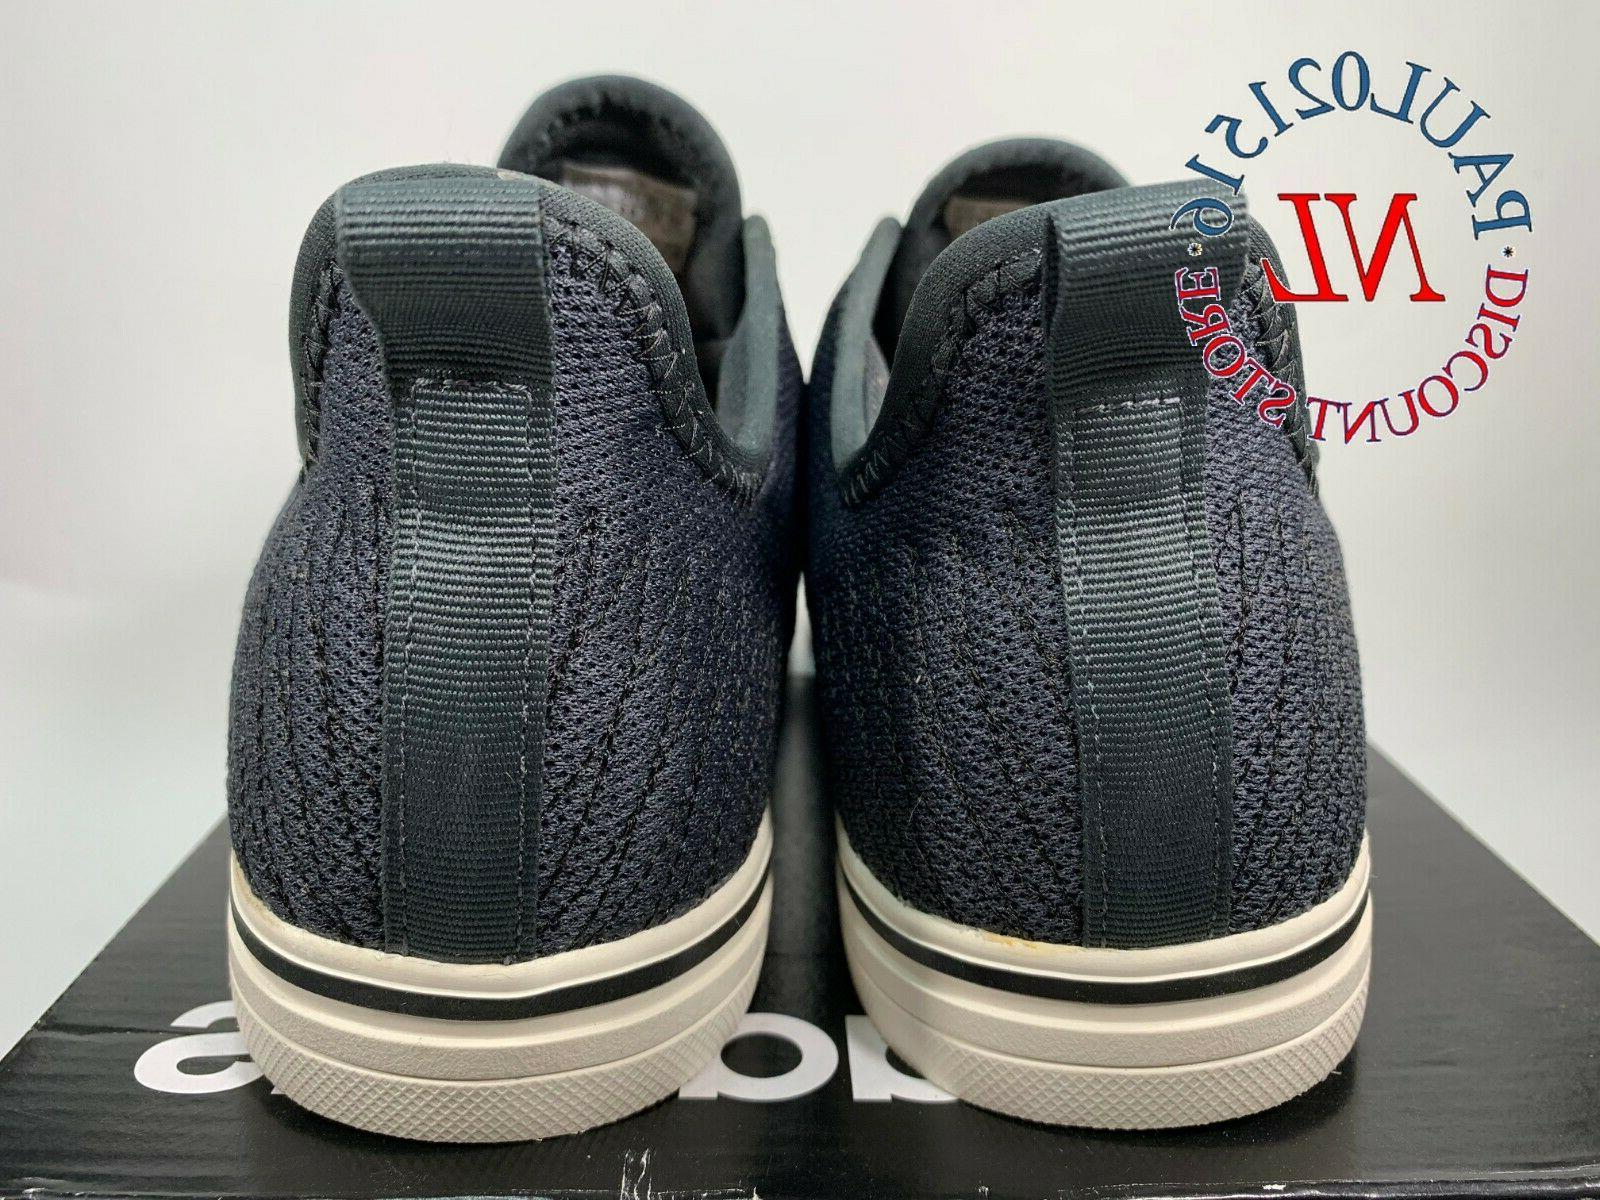 ADIDAS Black Skateboarding Shoes Various